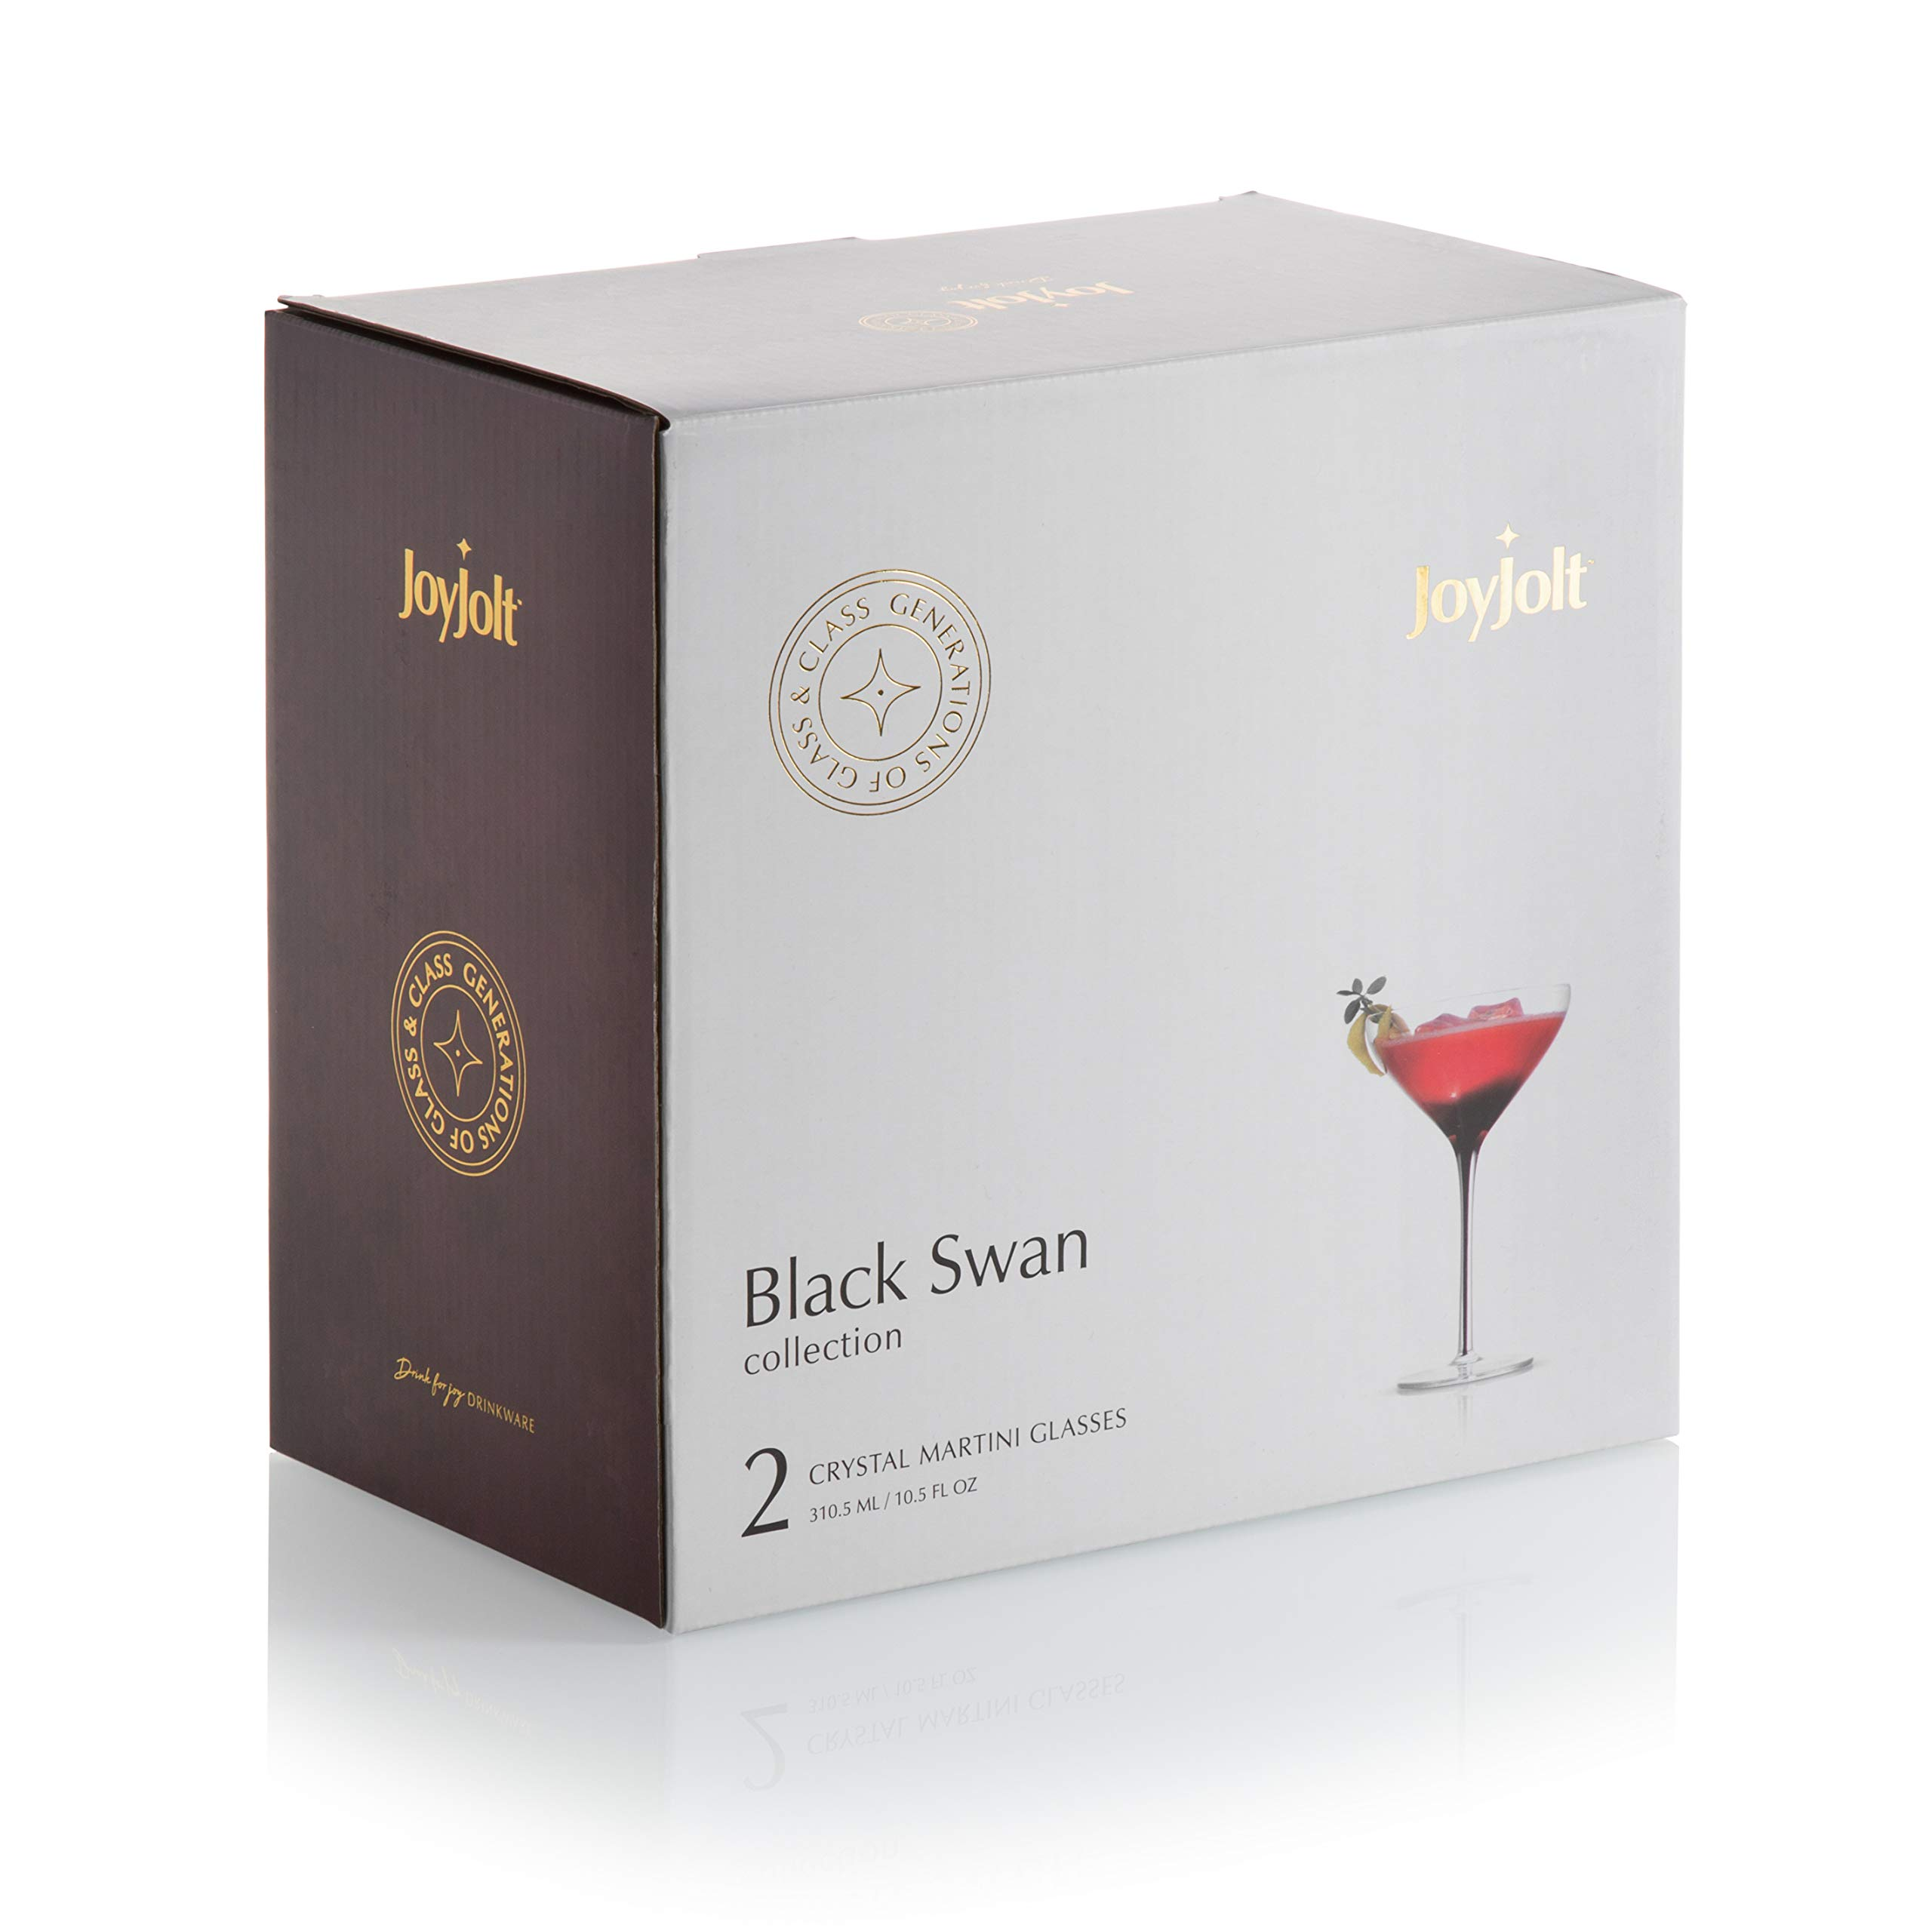 JoyJolt Black Swan Stemmed Martini Glasses, Premium Lead Free Crystal Glassware, 10.5 Oz Capacity, Set Of 2 by JoyJolt (Image #4)